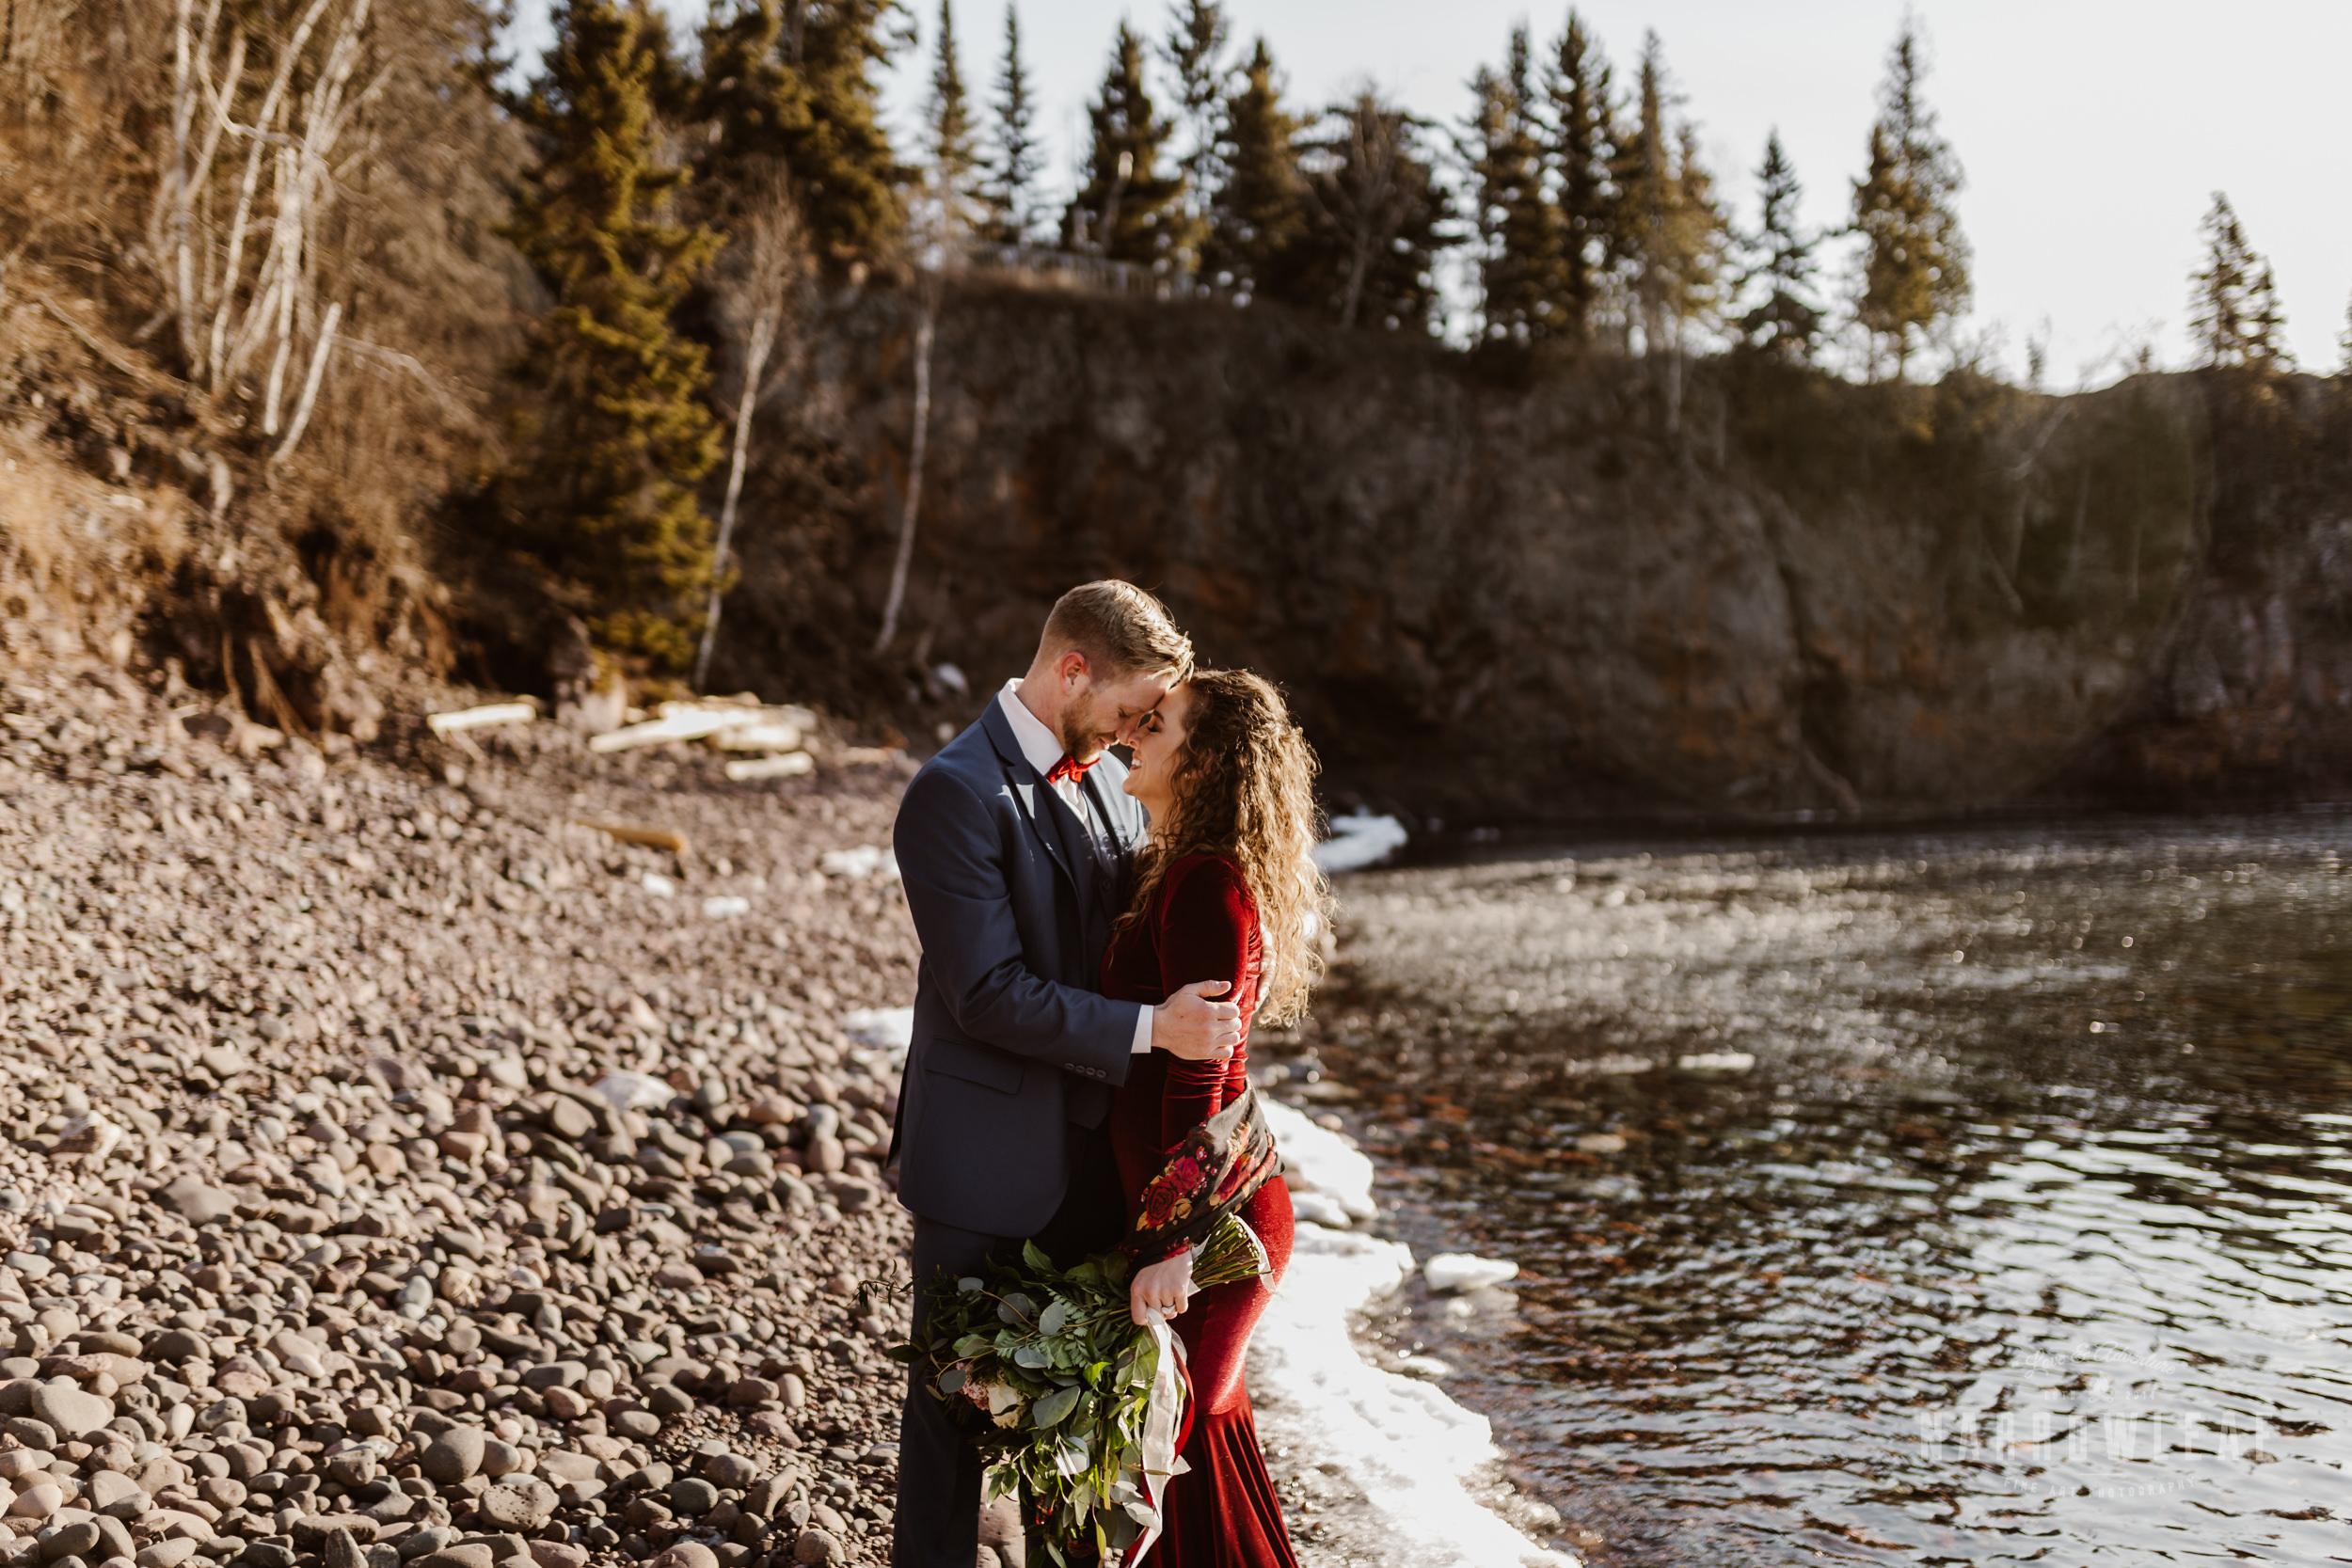 minnesota-adventure-elopement-Narrowleaf_Love_and_Adventure_Photography-8920.jpg